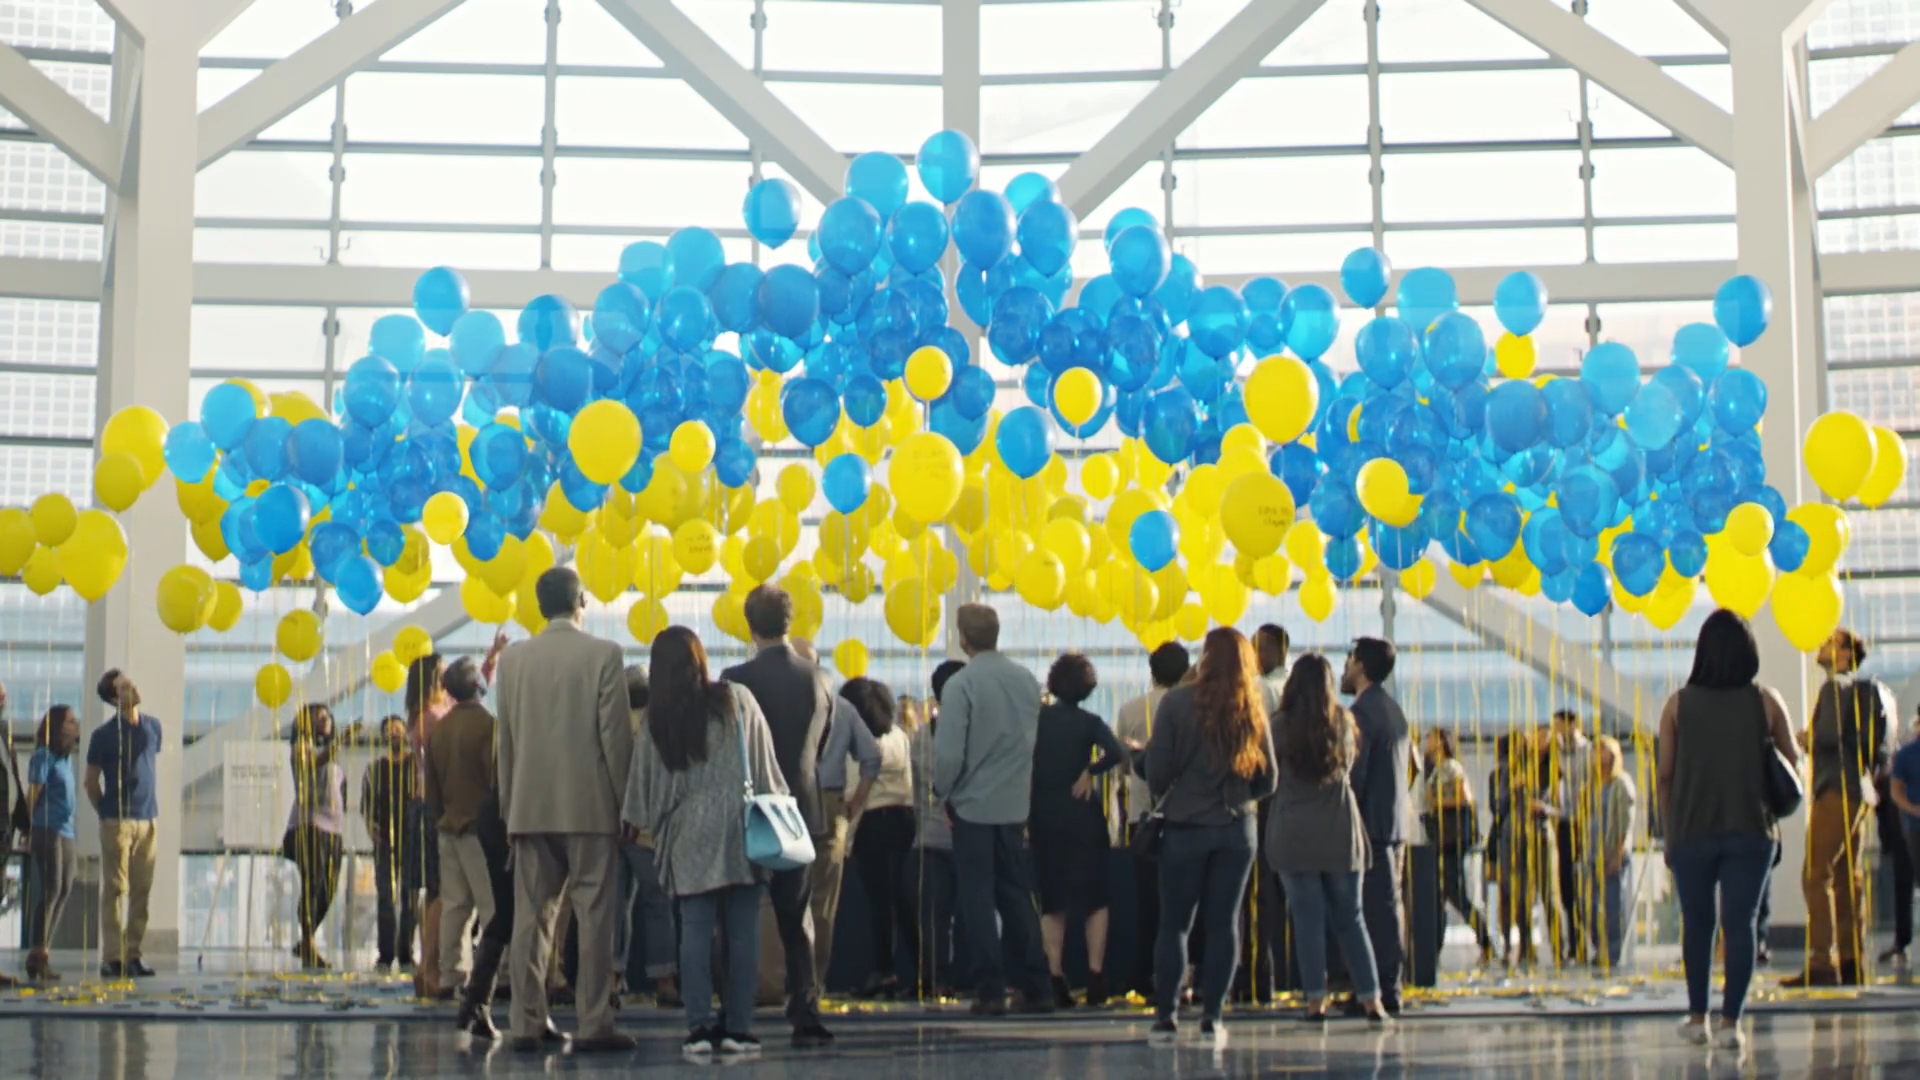 Balloons_1080p_02.jpg